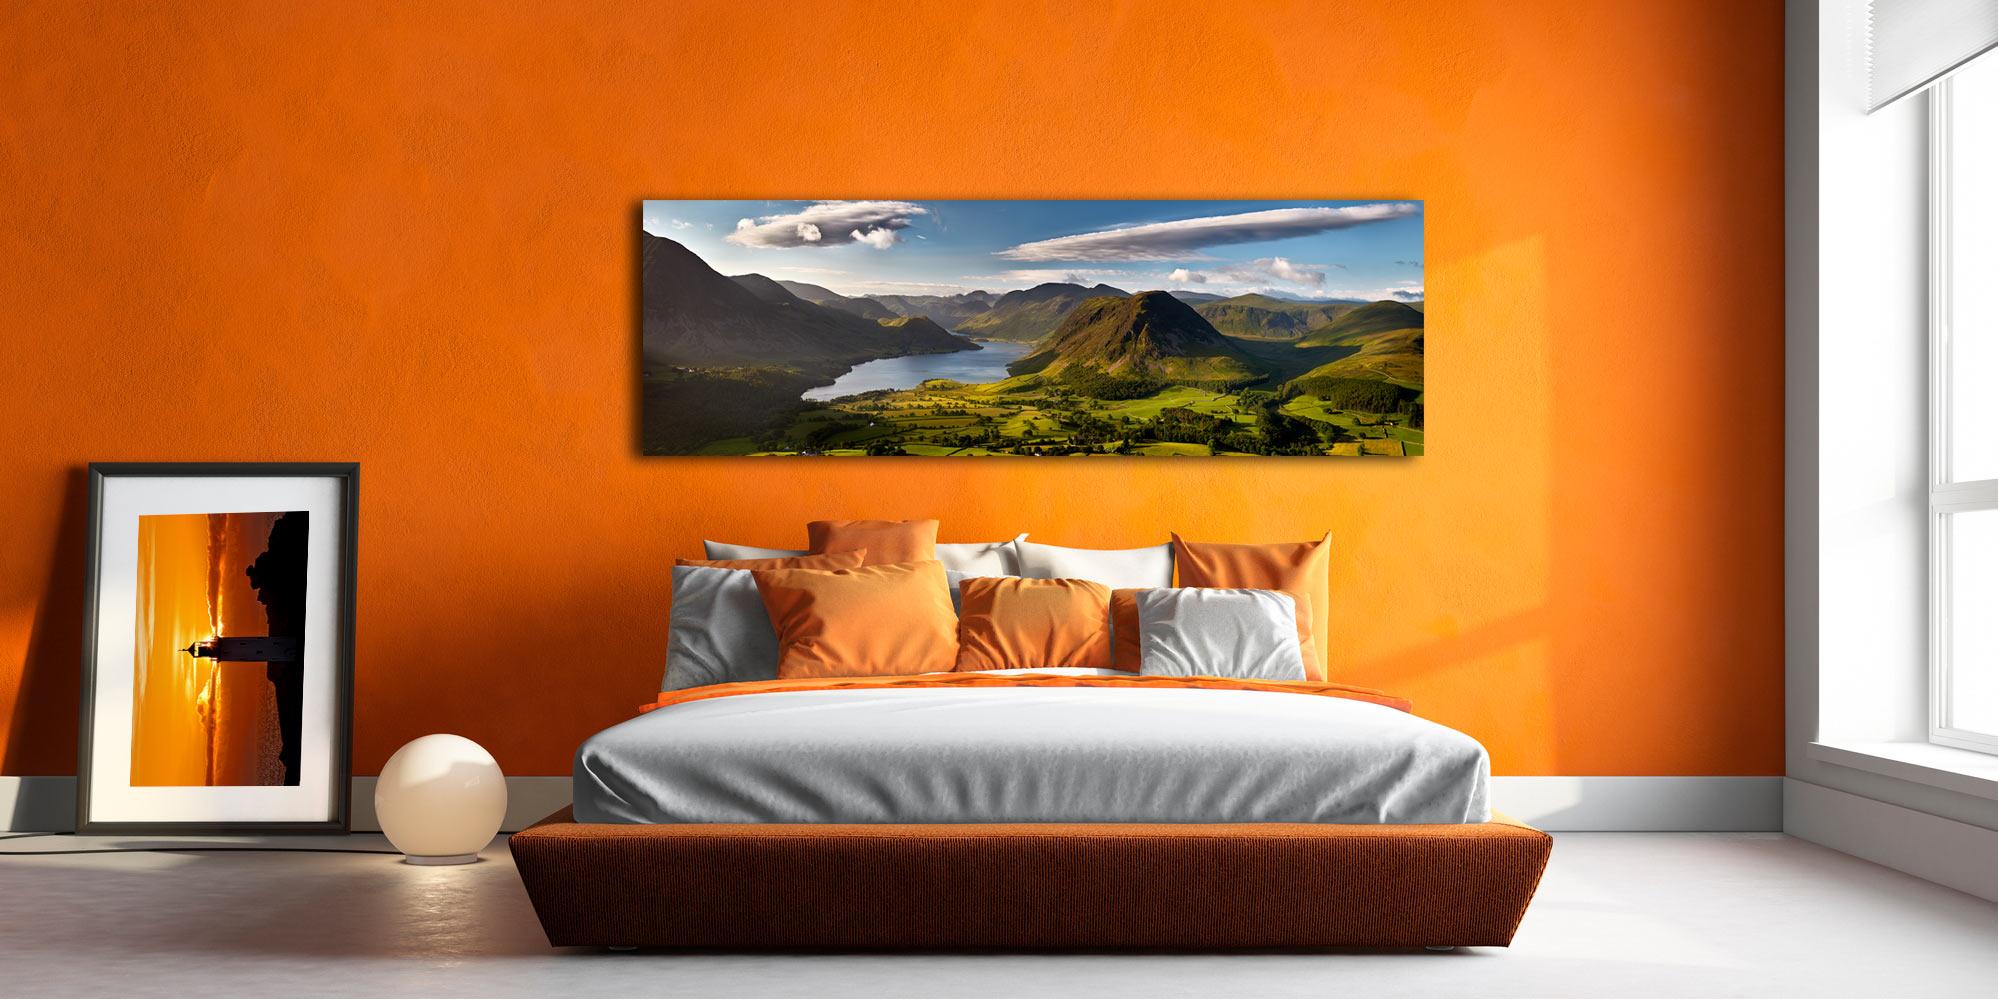 Morning Sunshine on Crummock Water - Canvas Prints Print on Wall